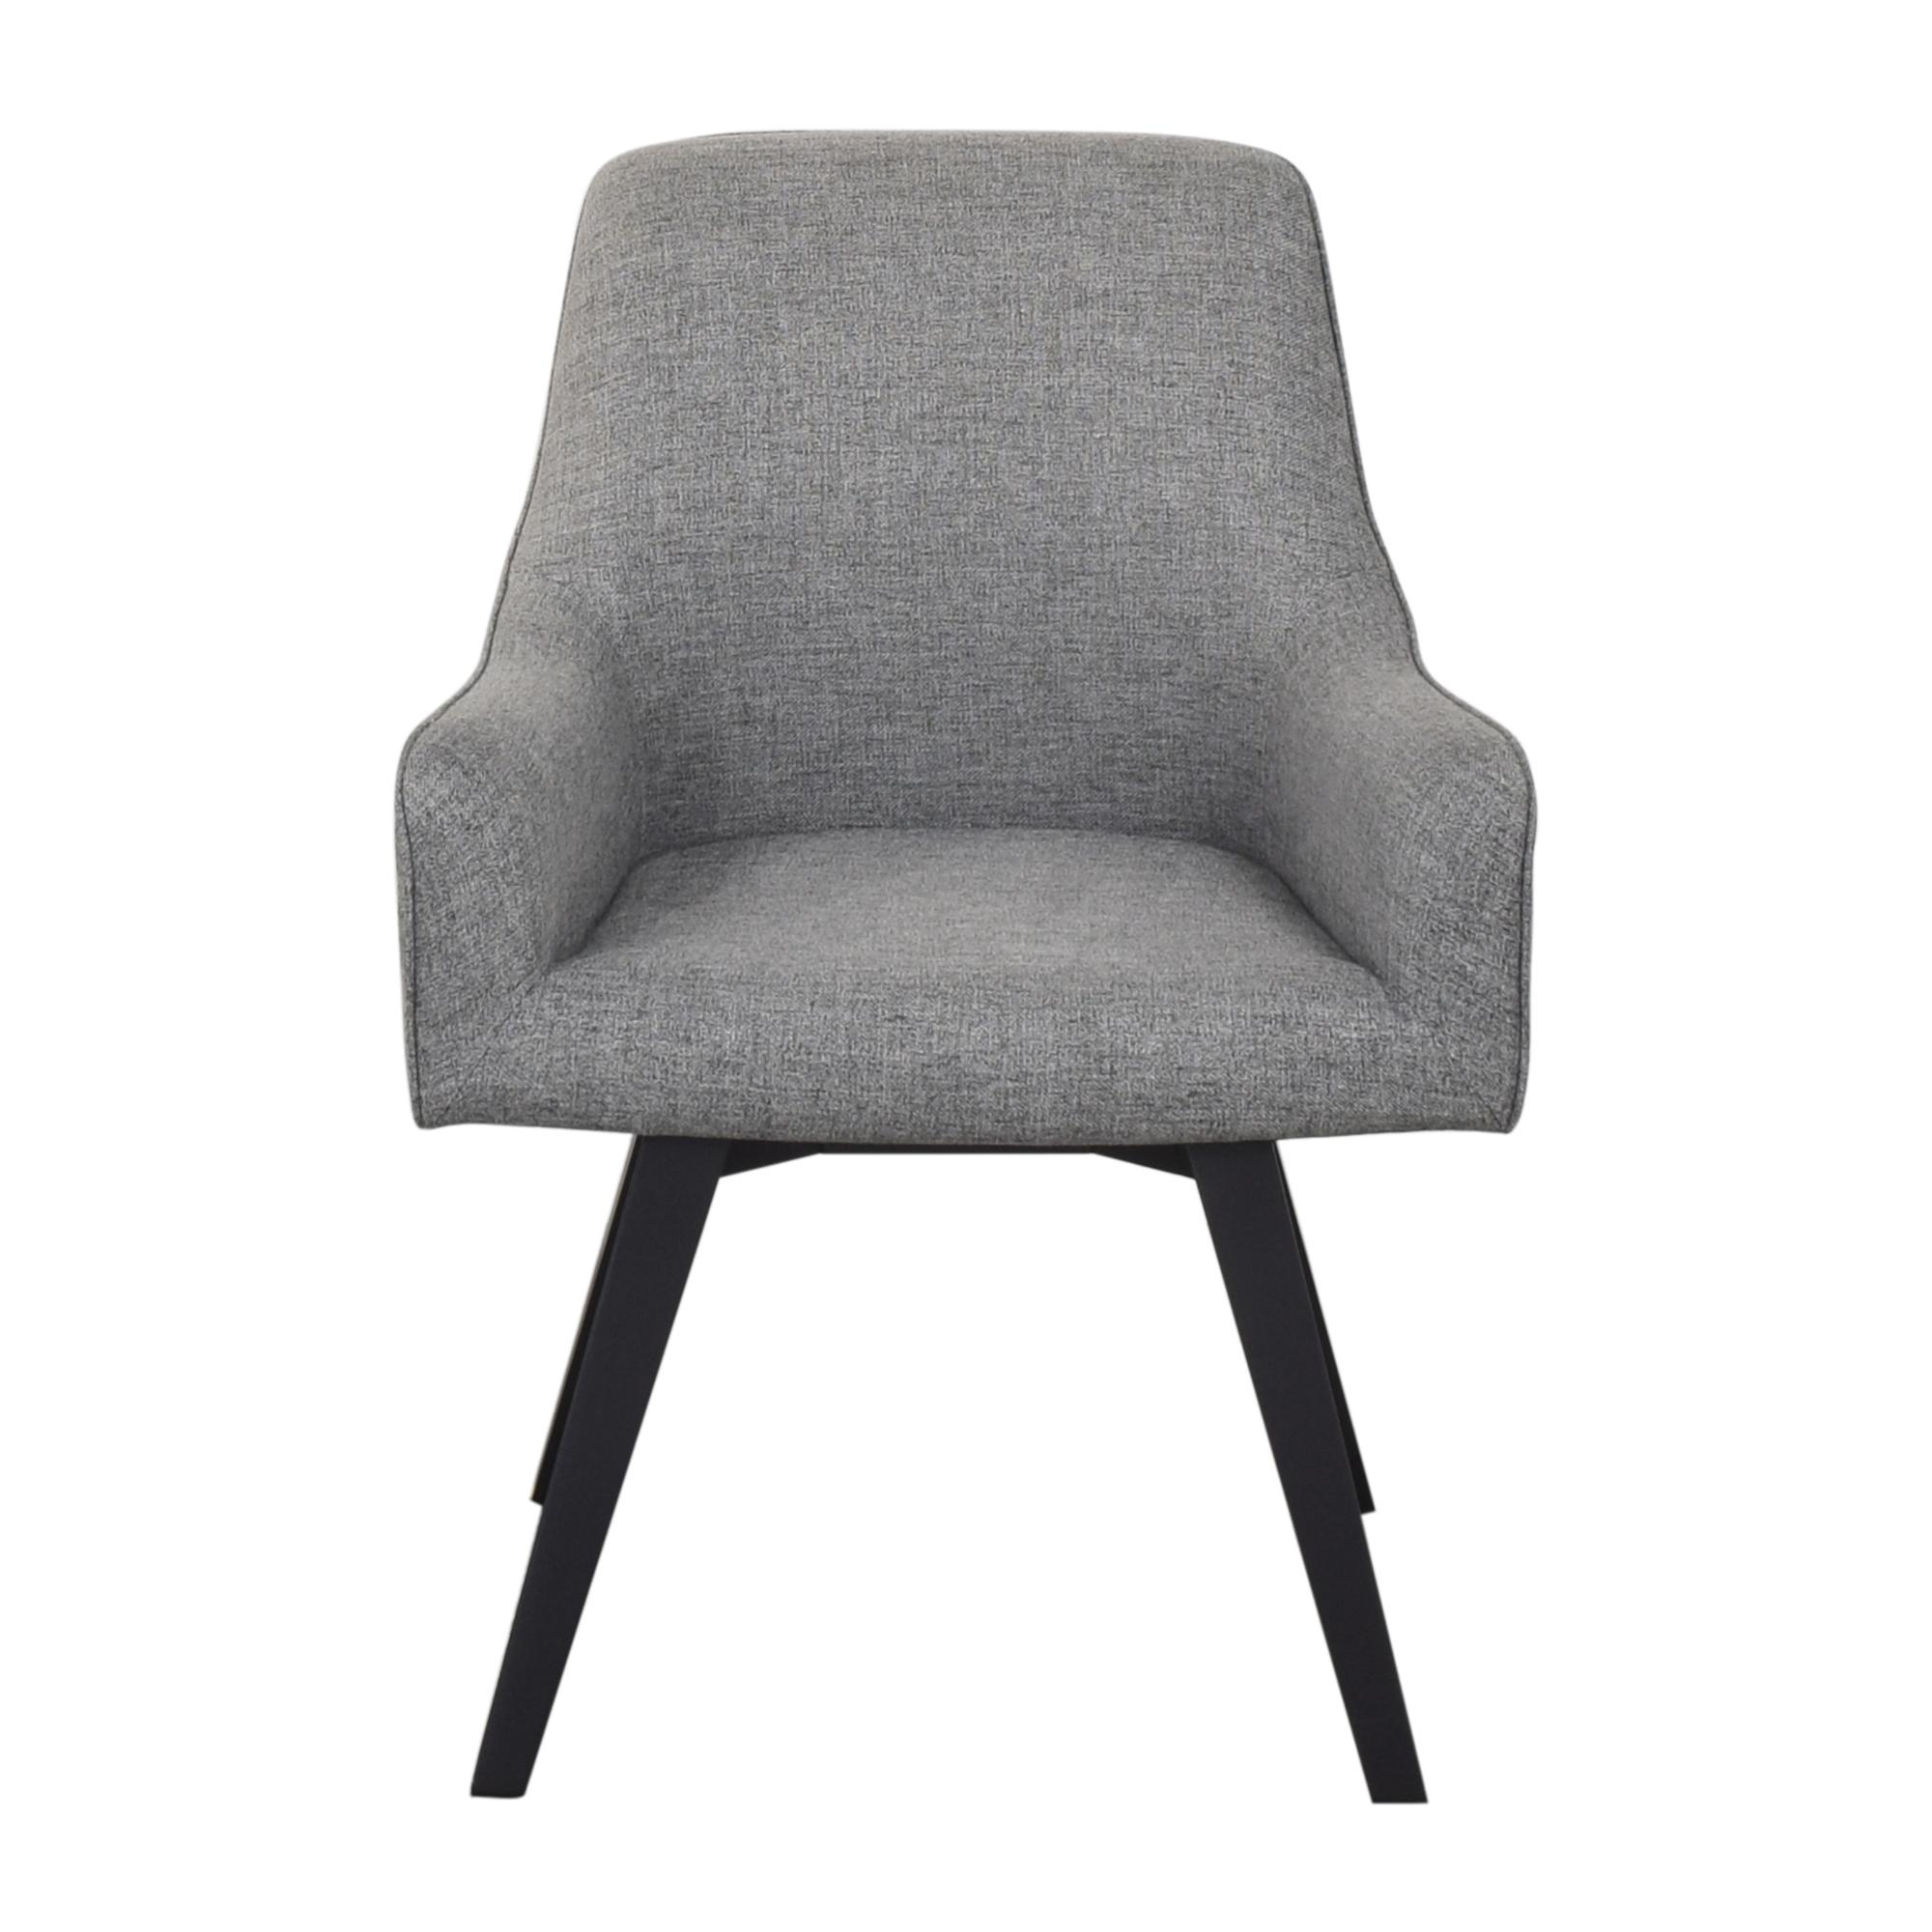 Crate & Barrel Harvey Swivel Arm Chair / Chairs